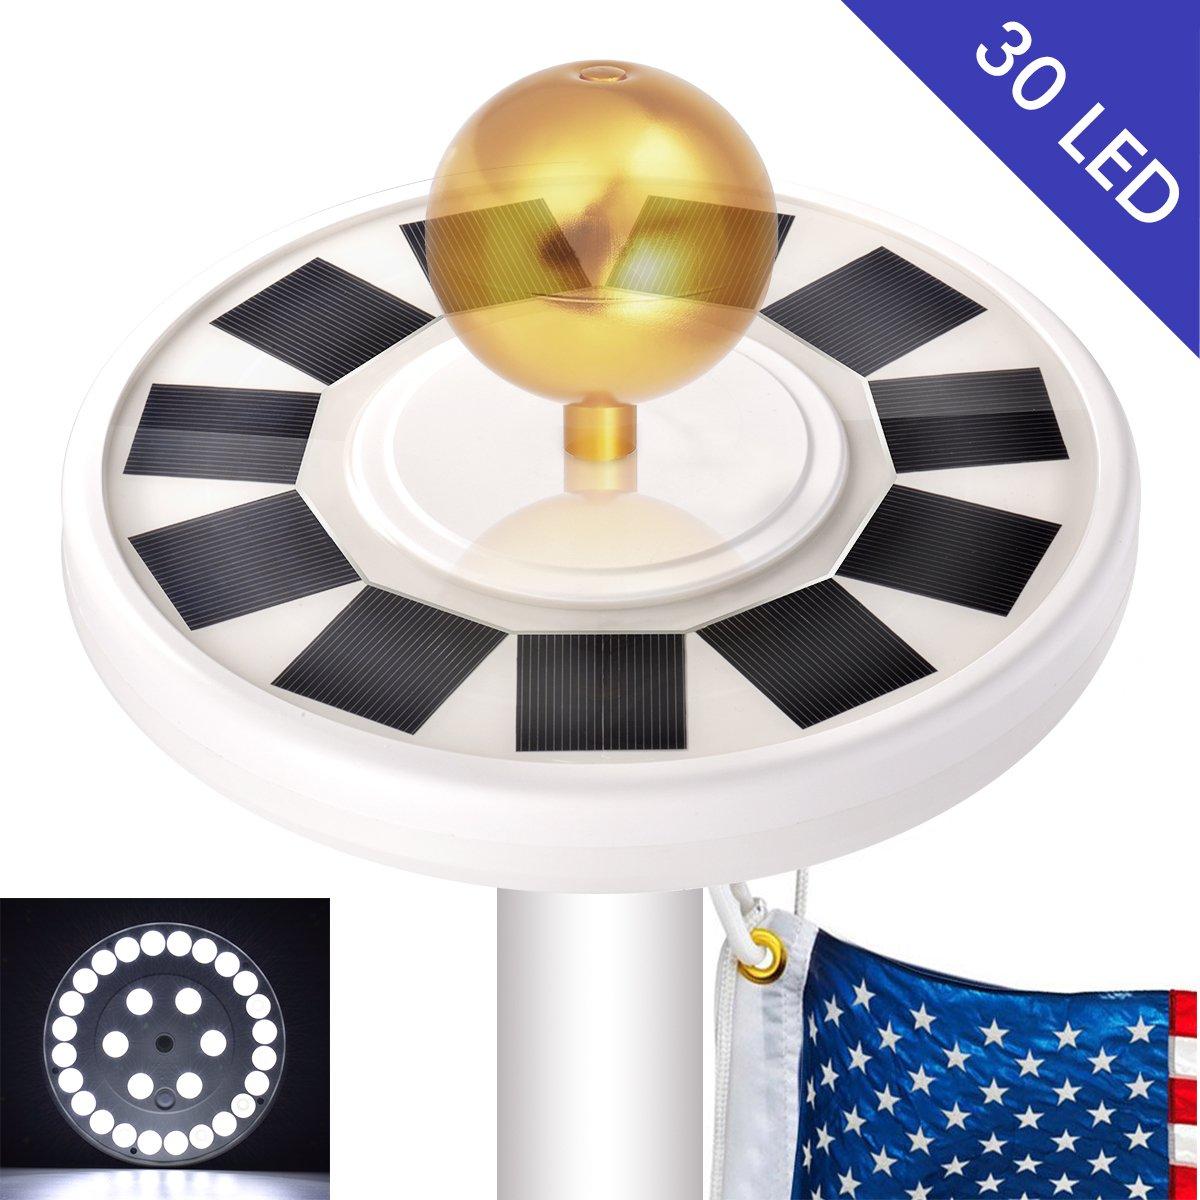 30 LED Solar Flag lights Flagpole Pole Lights Solar Powered Super Bright IP65 Waterproof, Bonega 30 LED Solar Flag Pole Lights Outdoor Dusk to Dawn for Most 15Ft 16ft 20Ft 25Ft Auto On/Off Night Light